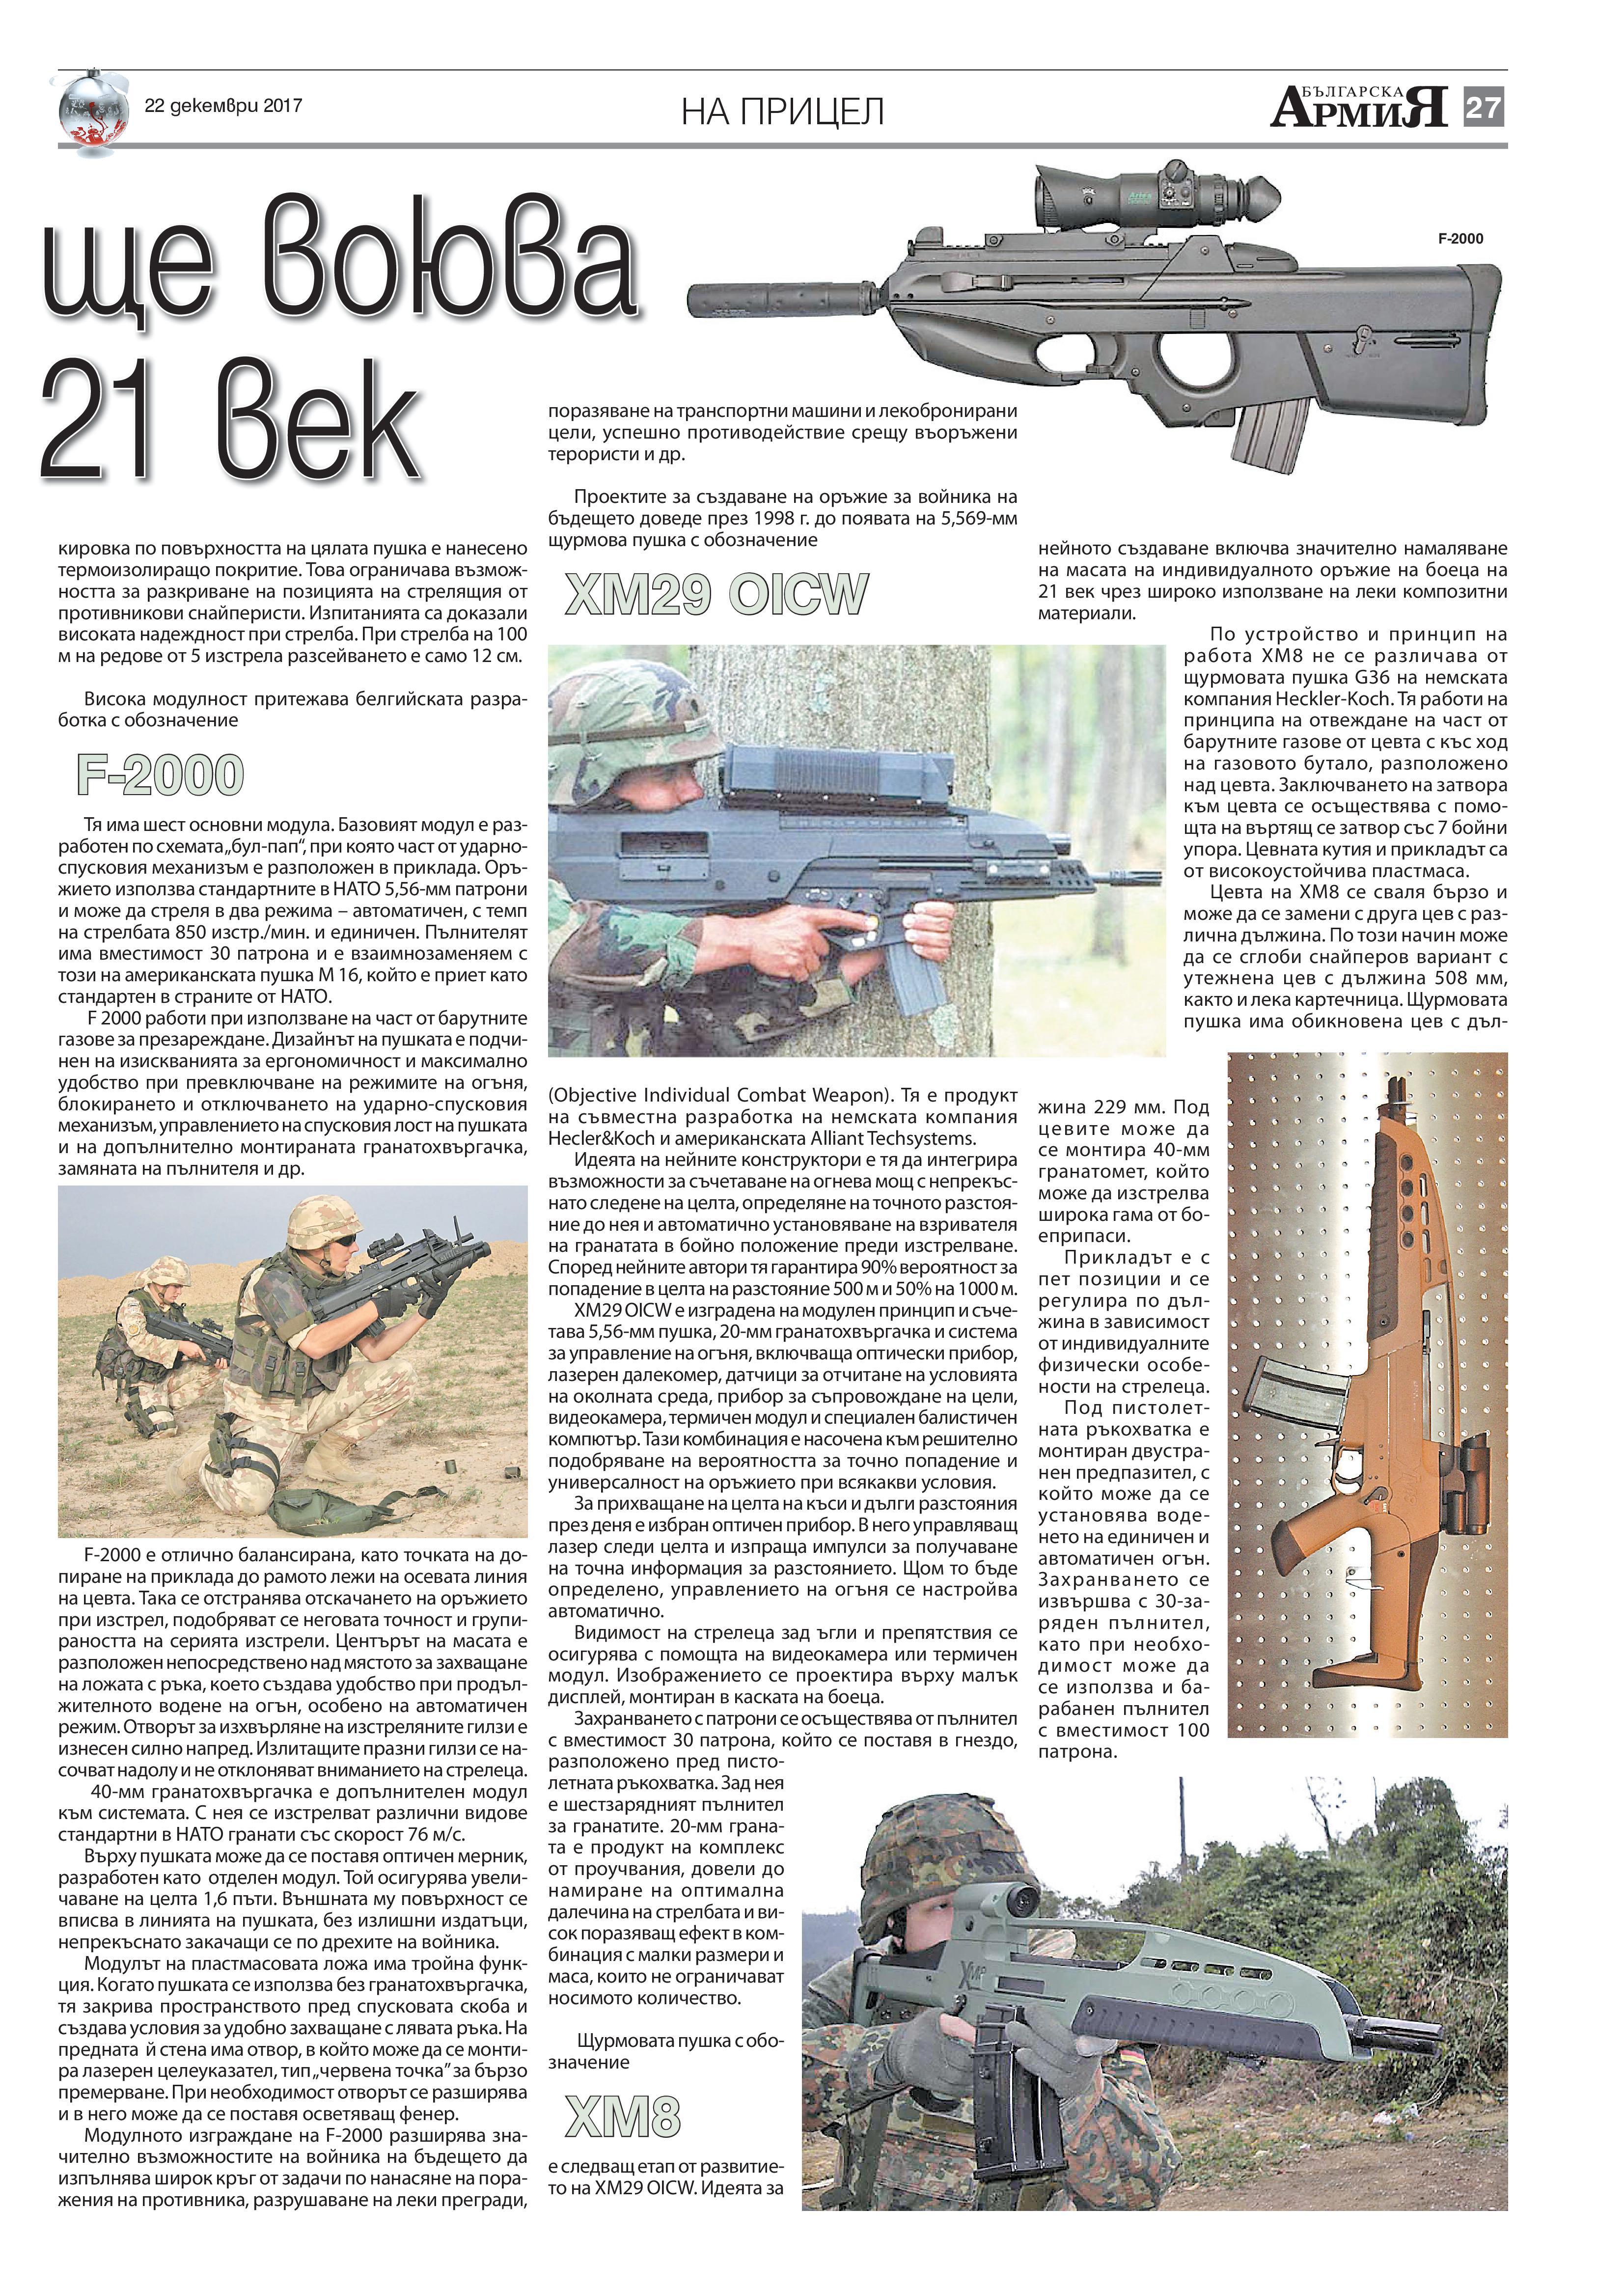 http://armymedia.bg/wp-content/uploads/2015/06/27-16.jpg